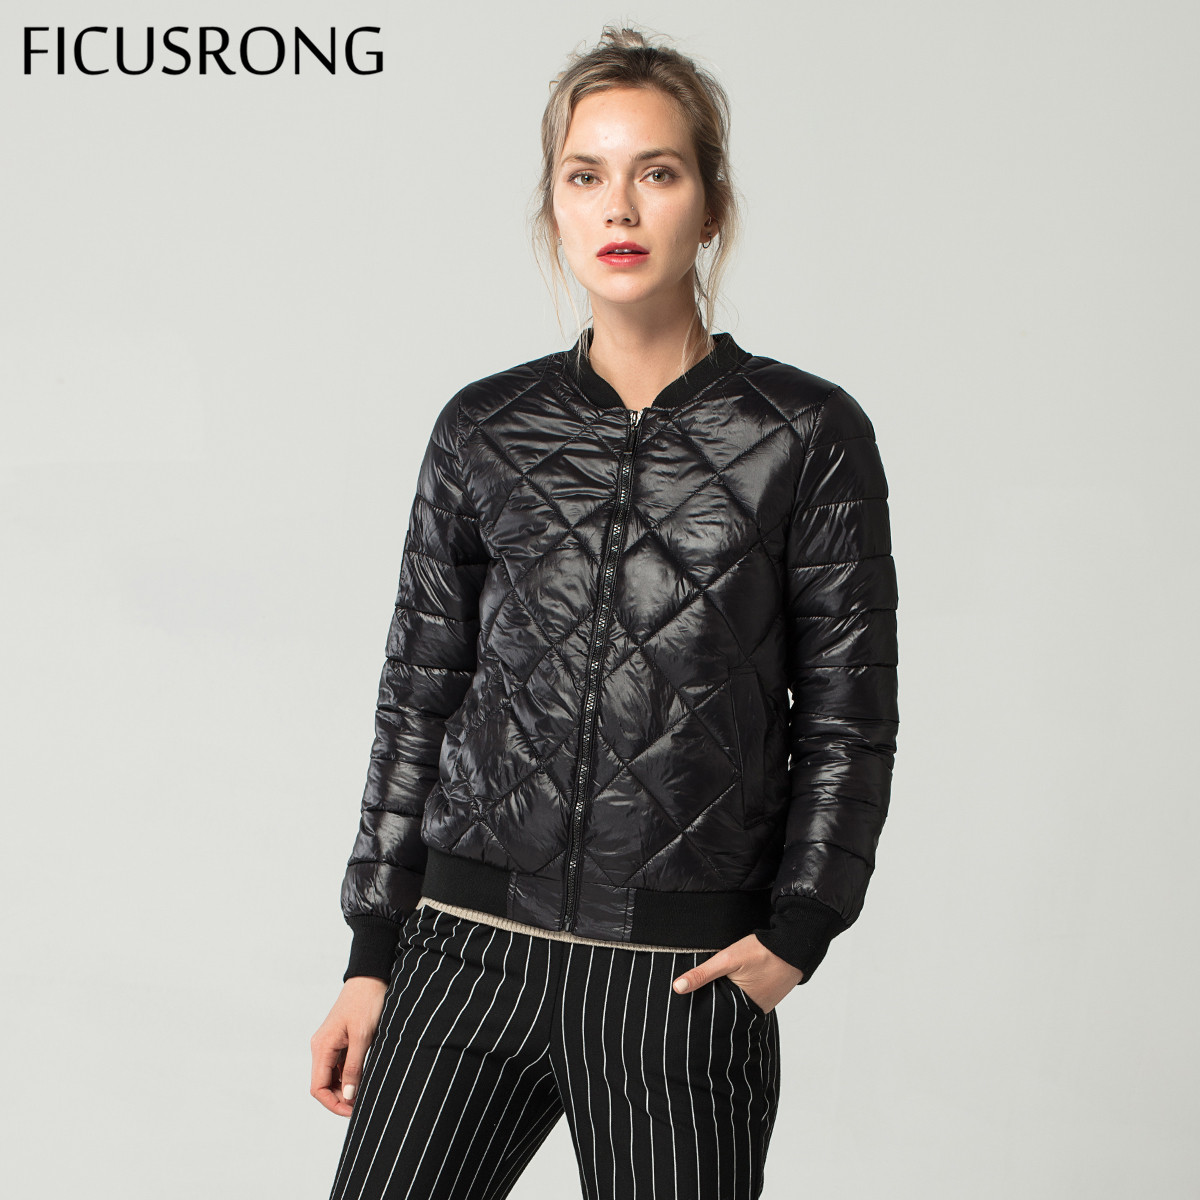 Fashion Soft Warm Autumn Winter Jacket Women Down   Parkas   Cotton Padded Jacket Girls Slim Female Jacket Coat FICUSRONG 2018 New